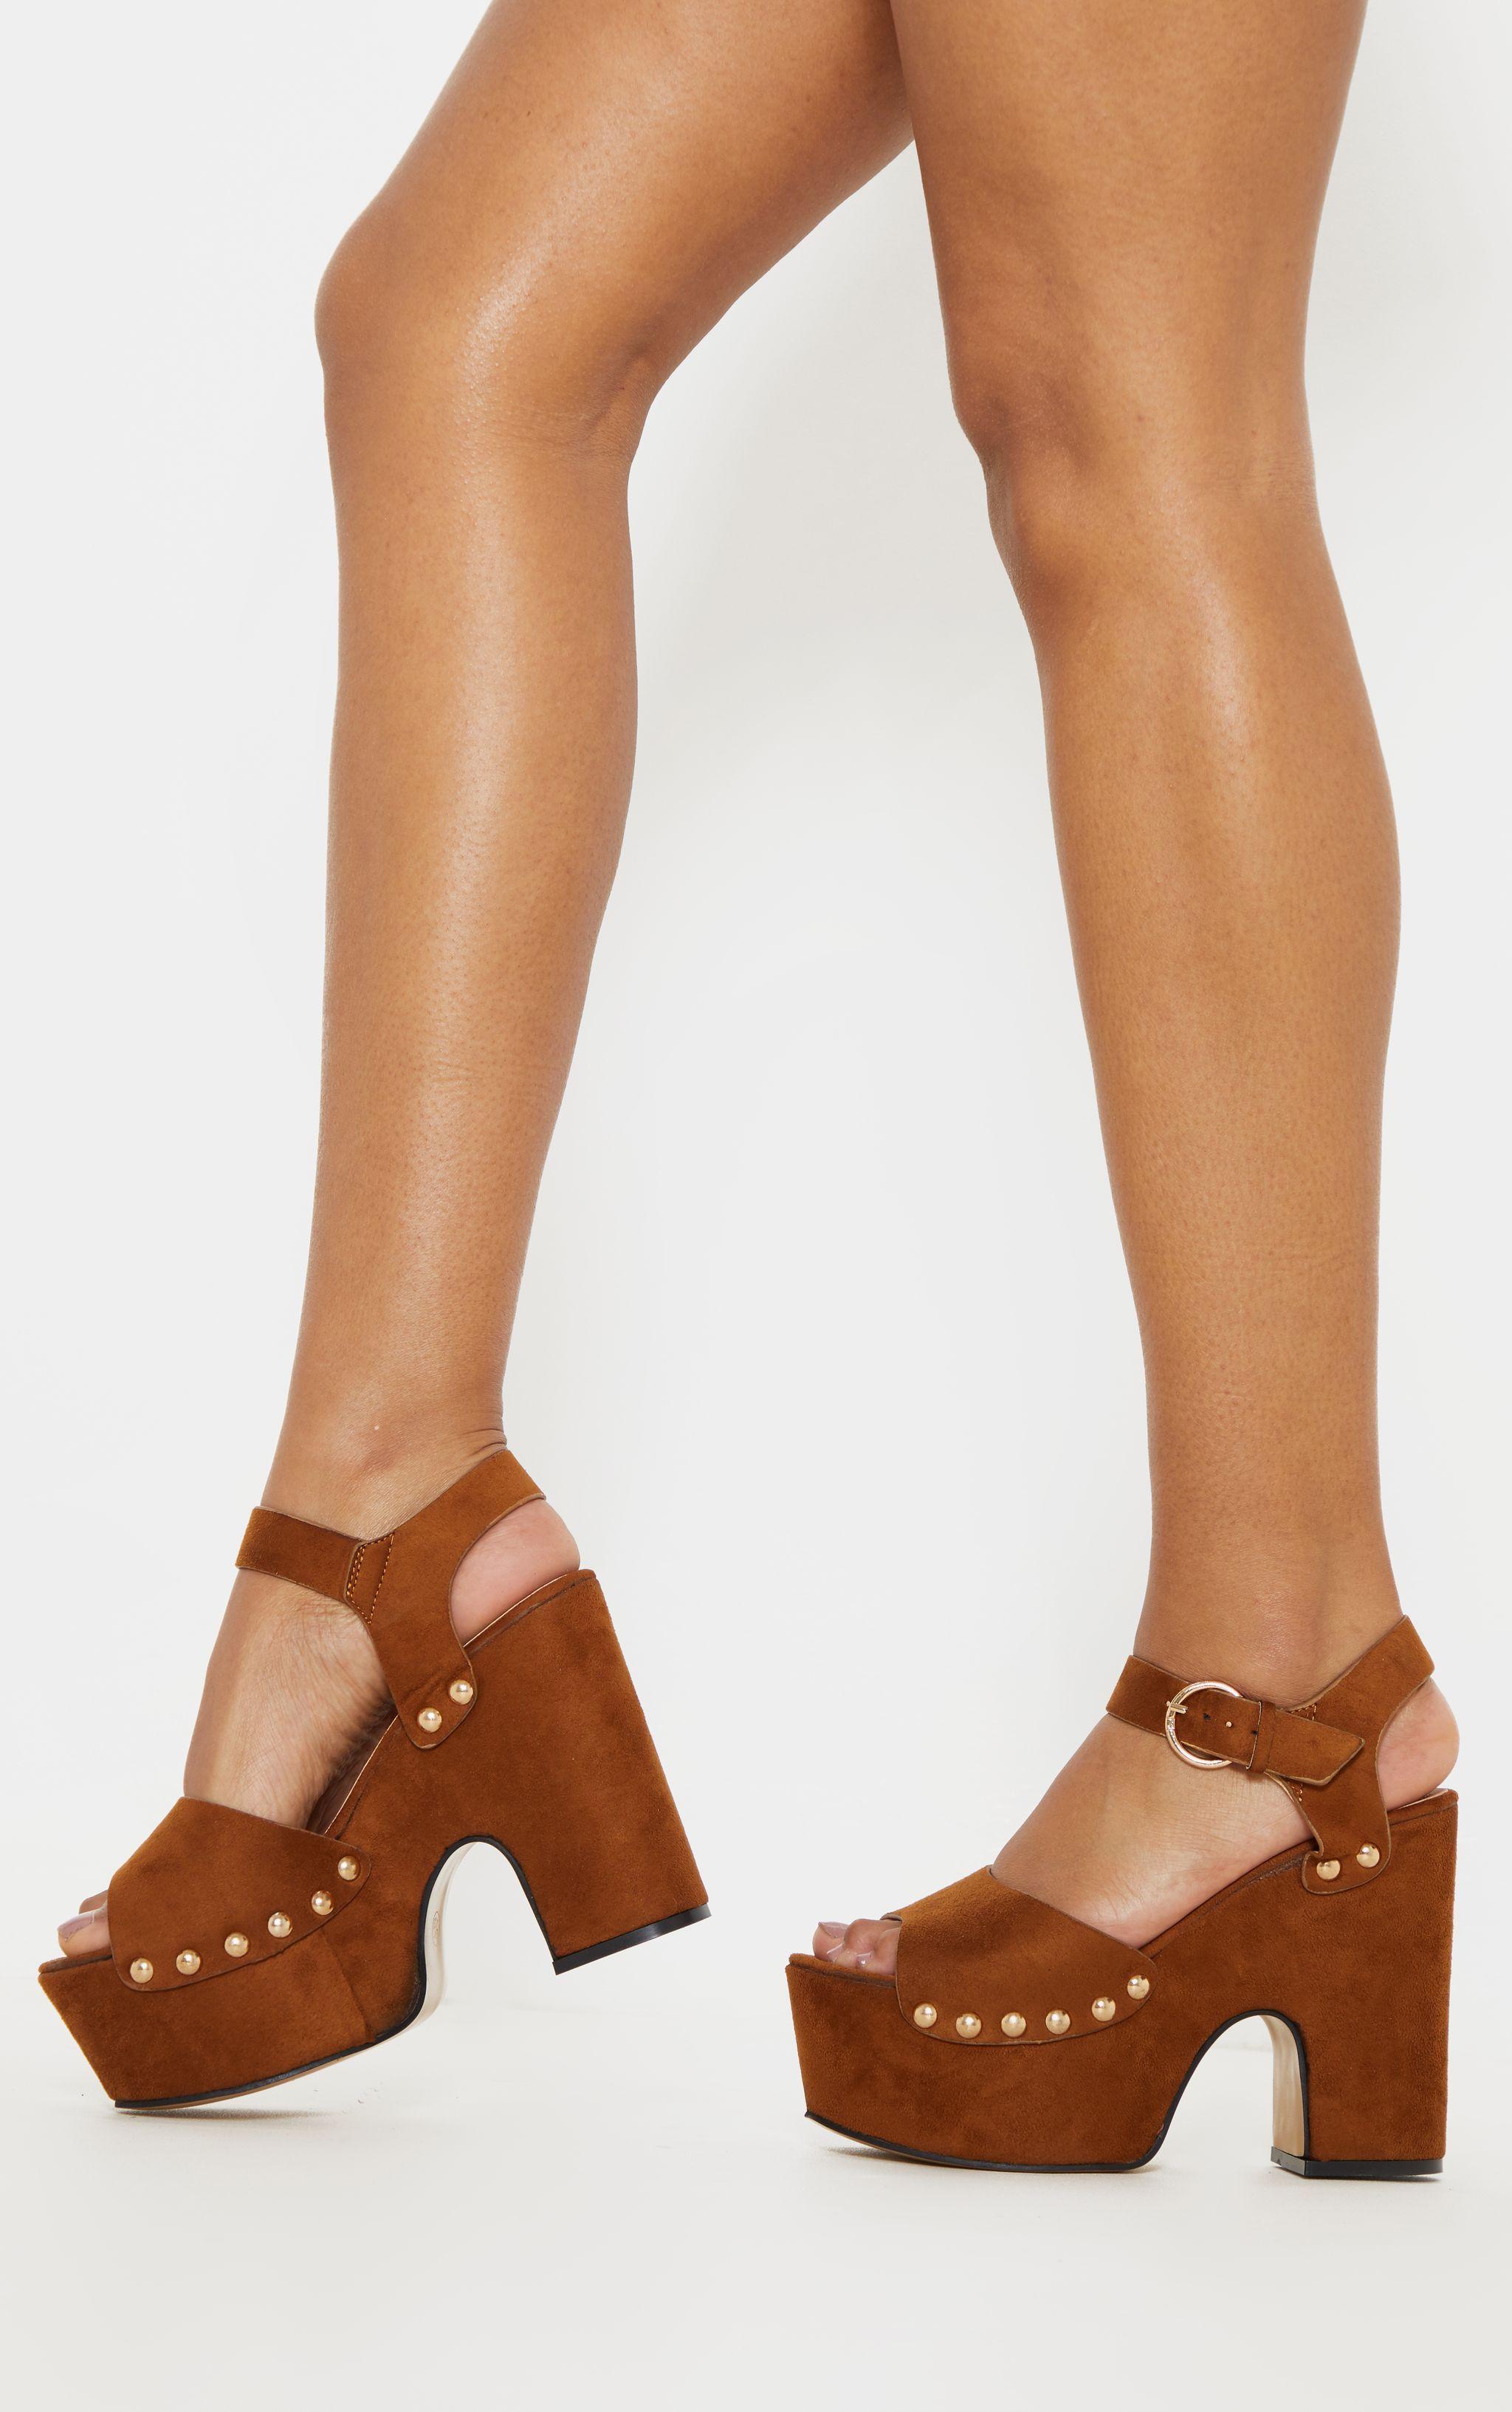 30a7b0f62d Tan Studded Platform Sandal in 2019 | Products | Sandals, Platform ...